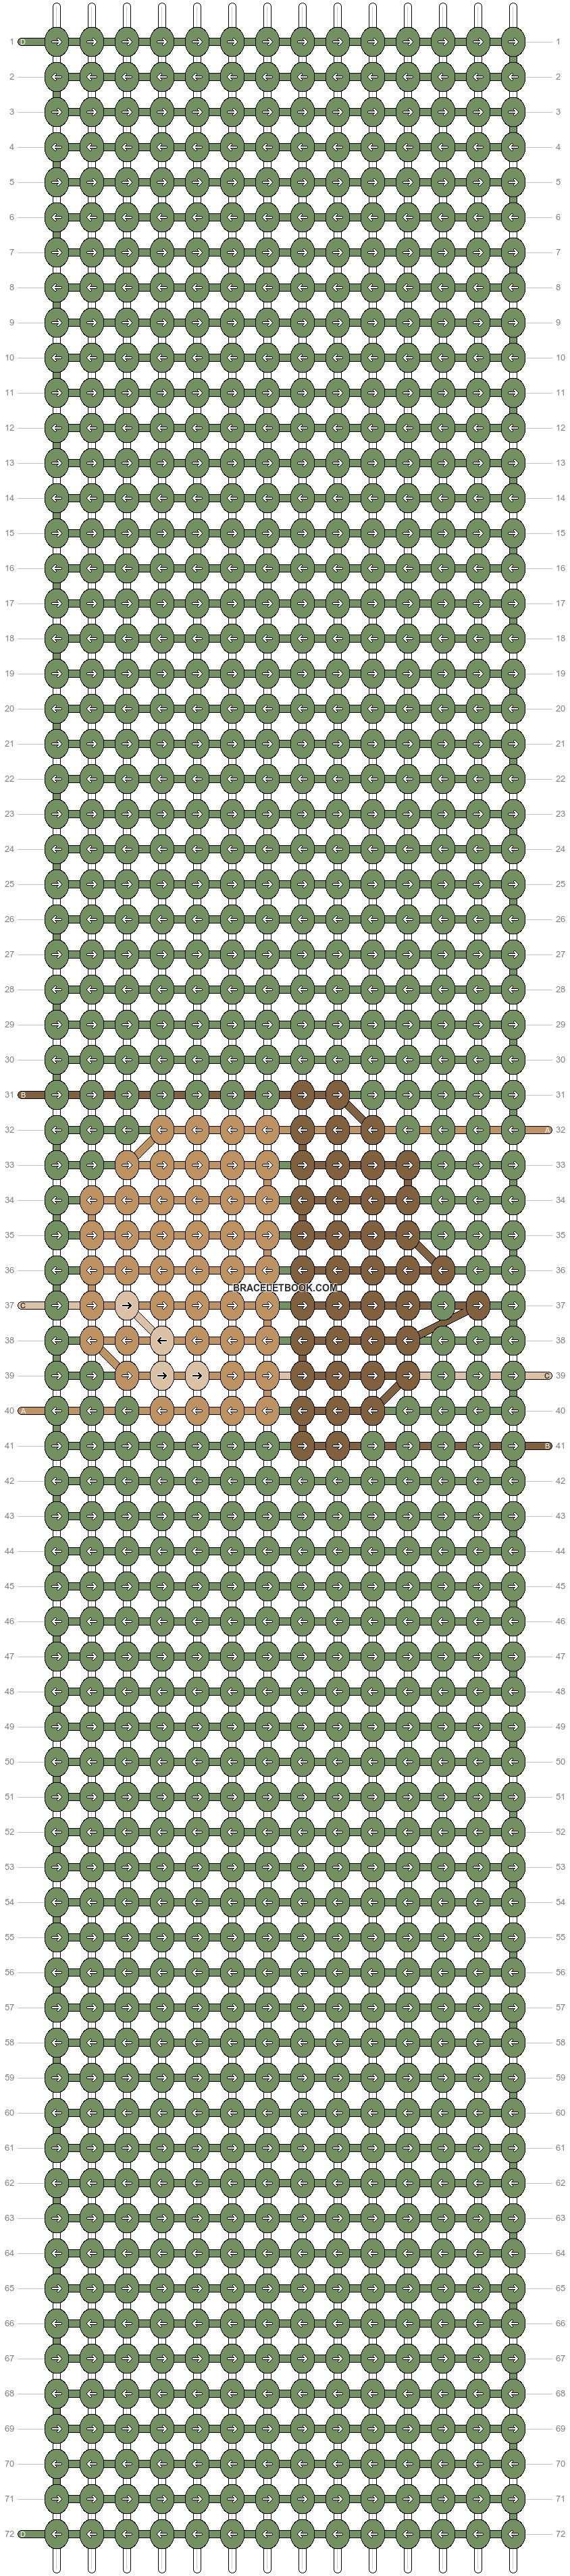 Alpha pattern #54958 pattern